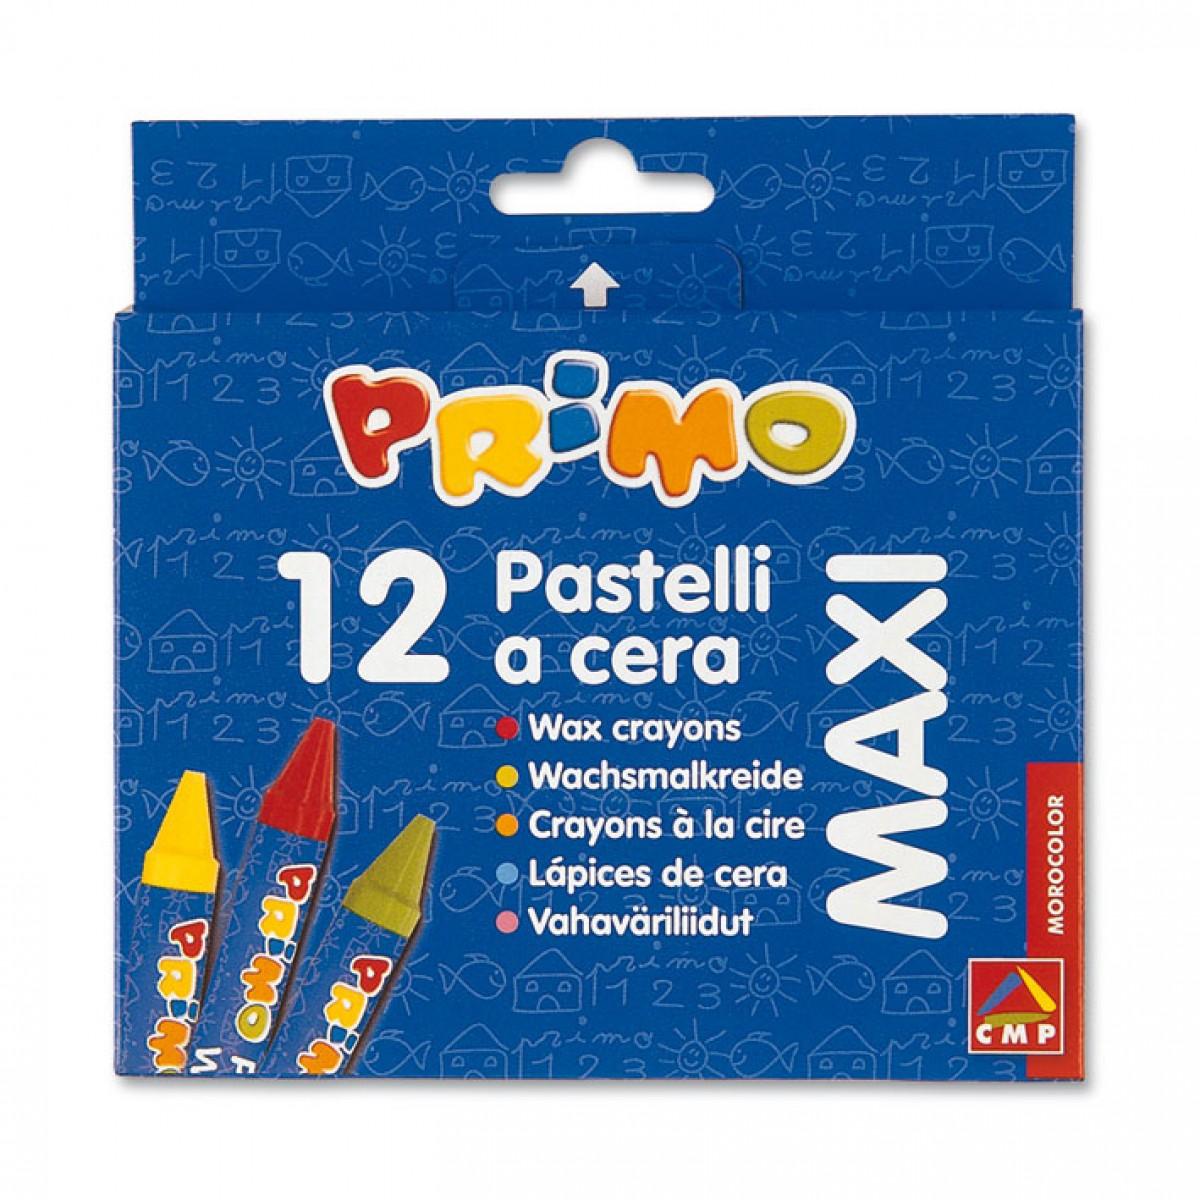 Primo Κηρομπογιές Maxi (12 Τεμ.) Κηρομπογιές